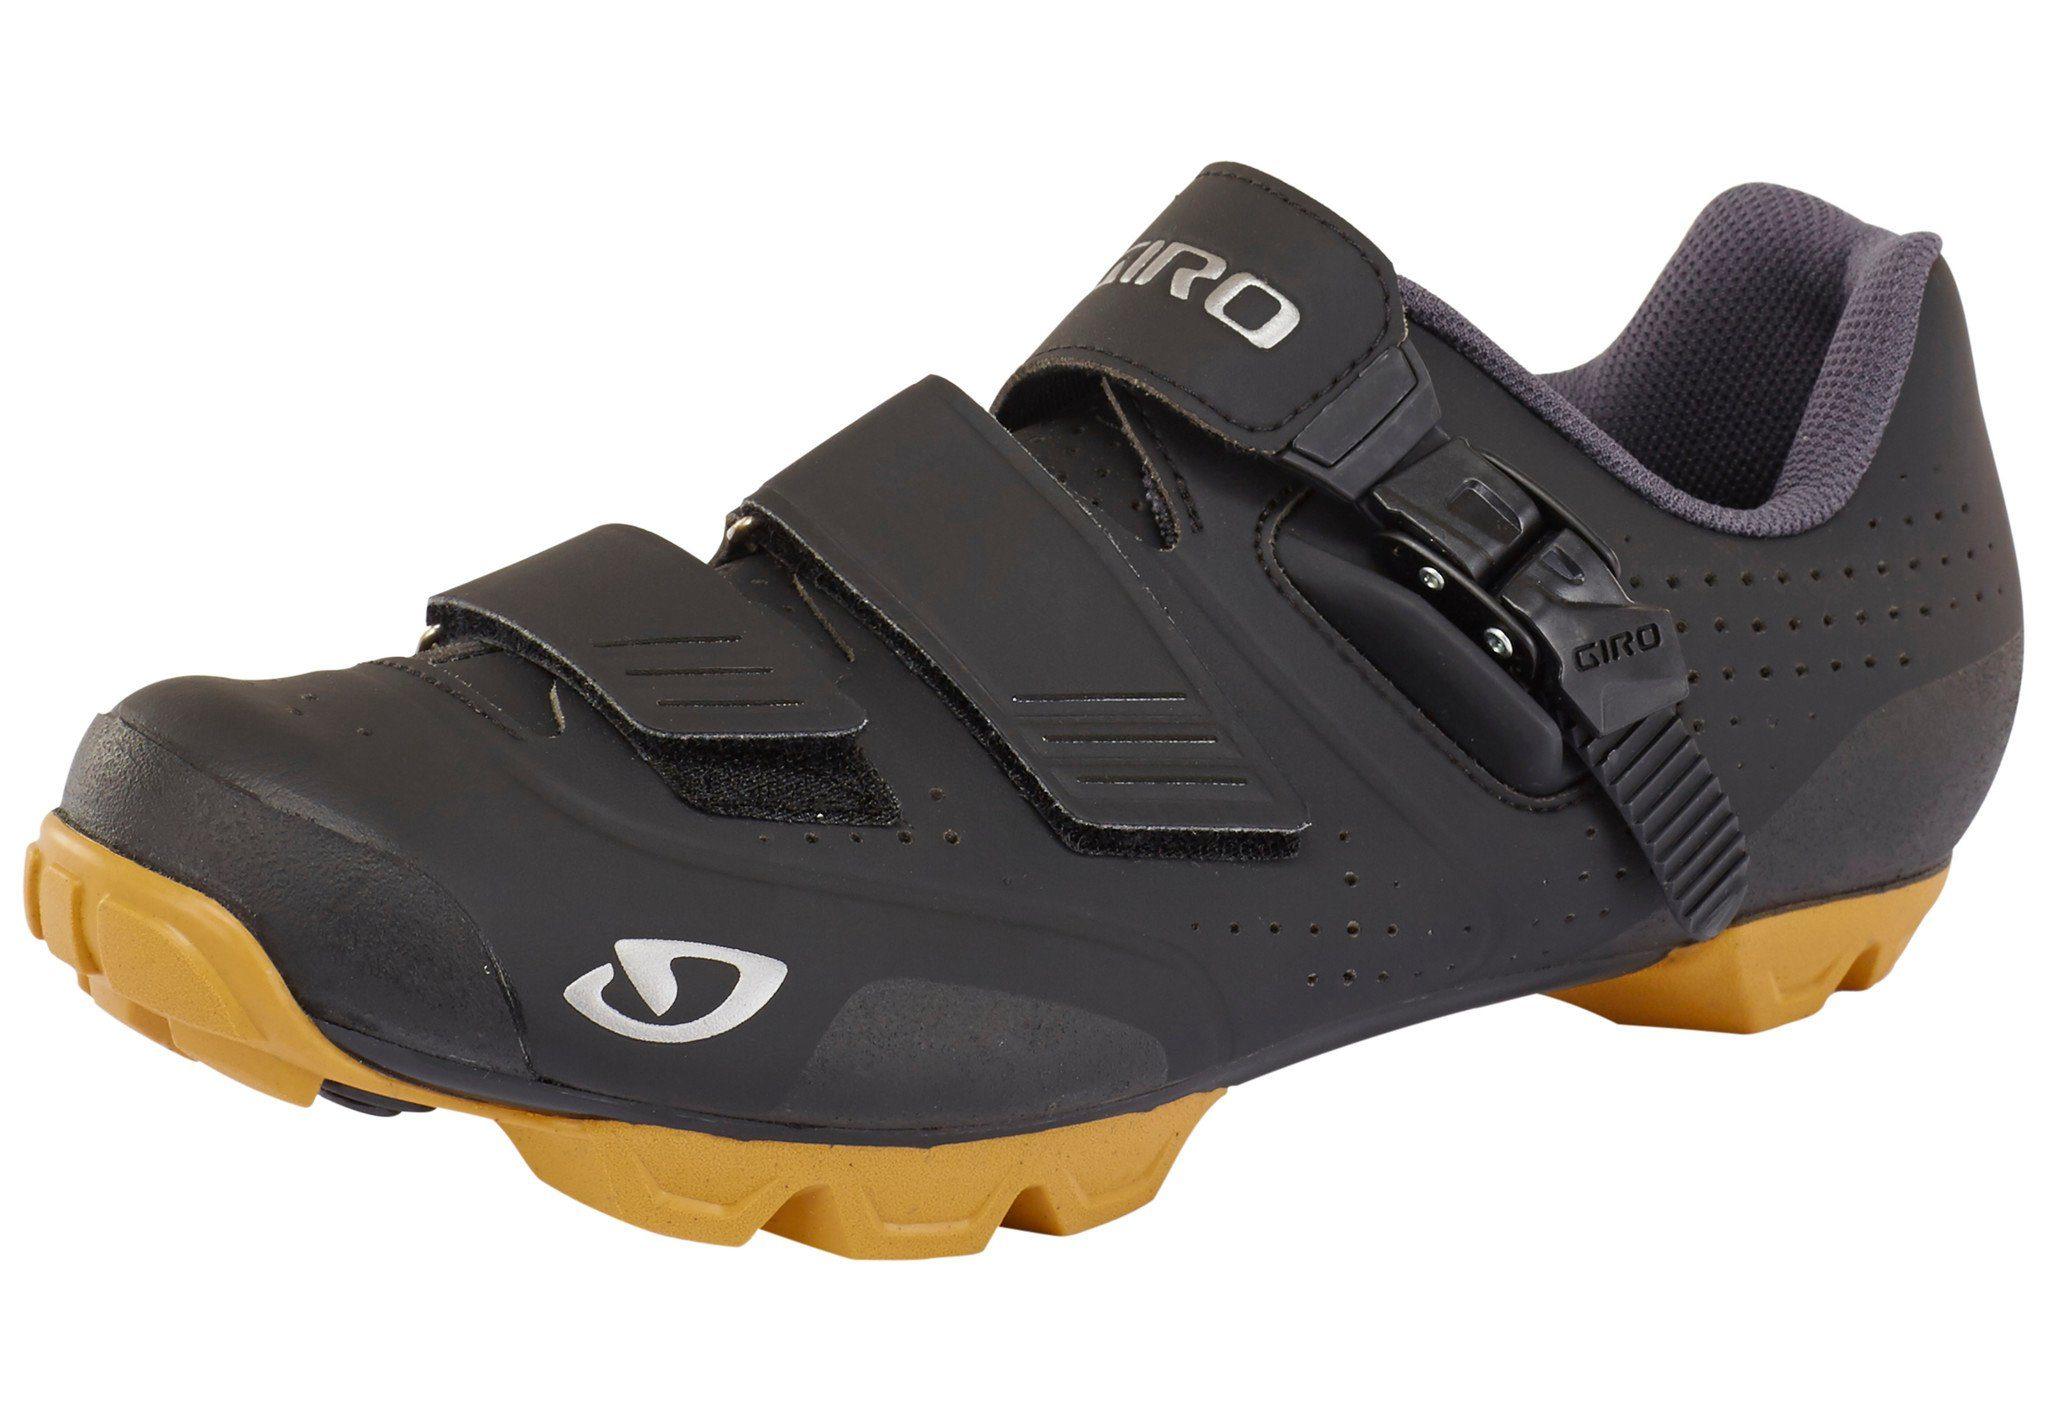 Giro Fahrradschuhe Privateer R Shoes Men kaufen  schwarz